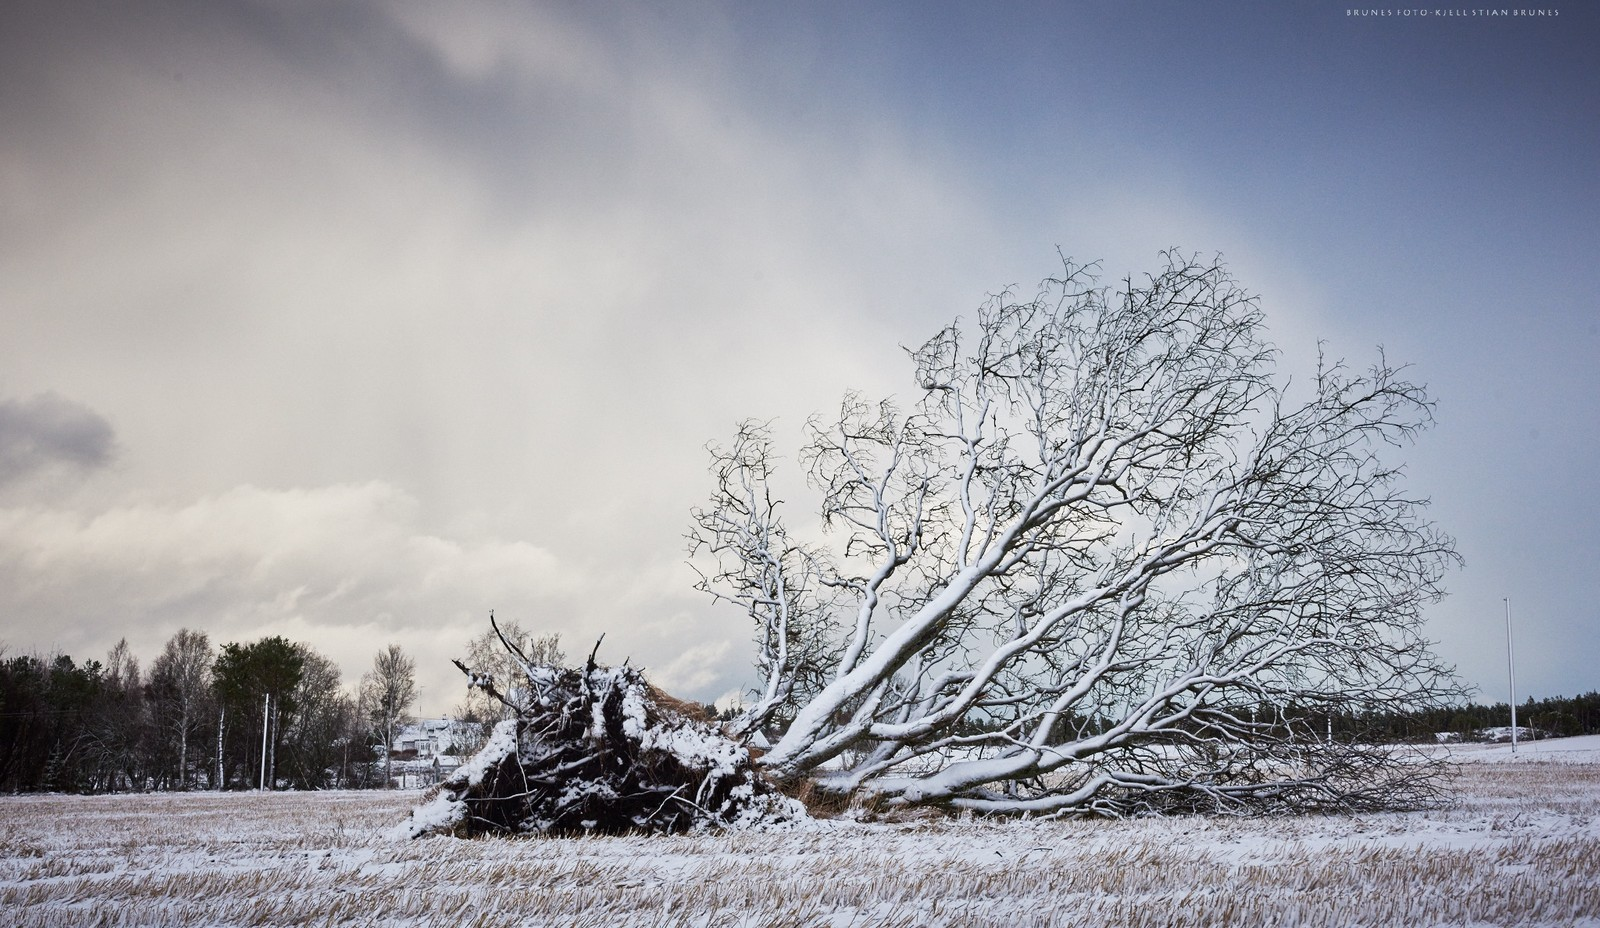 Dette over 100 år gamle seljetreet som har stått på Rød i Gossen i Aukra kommune, måtte gi tapt for uværet Tor.